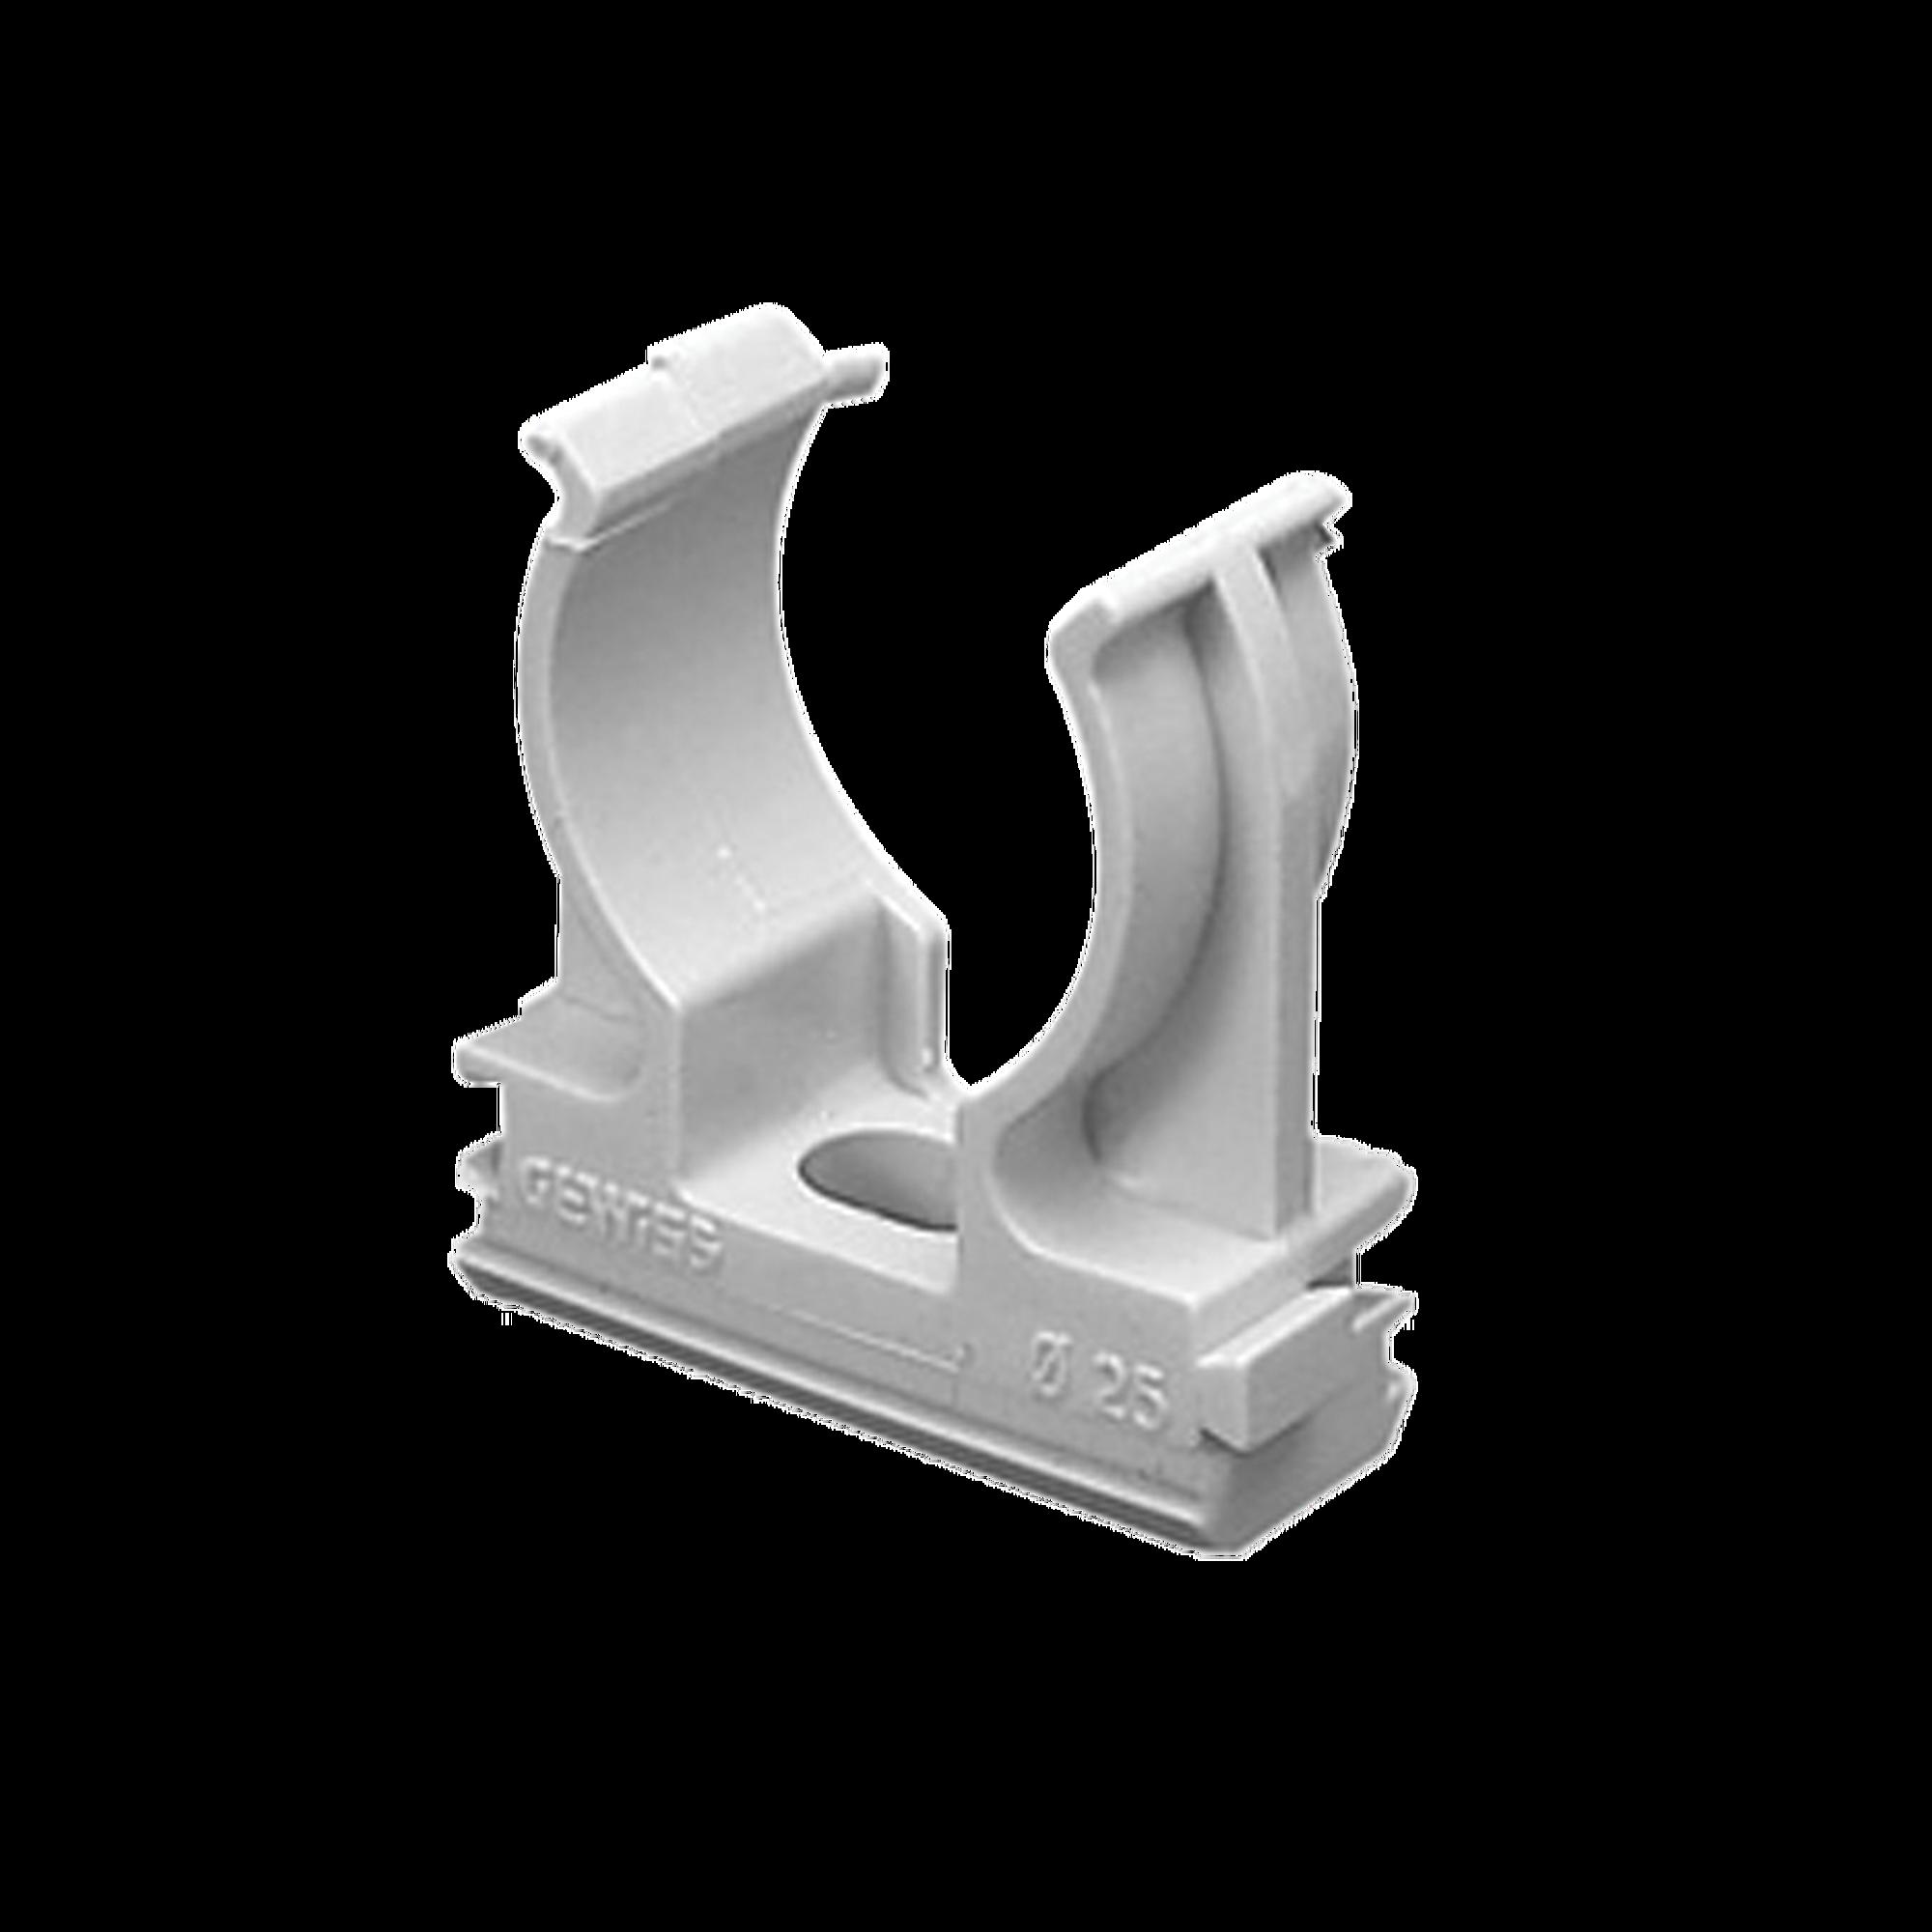 Soporte de presión (Abrazadera), PVC Auto-extinguible, abierto para tubería de 50 mm